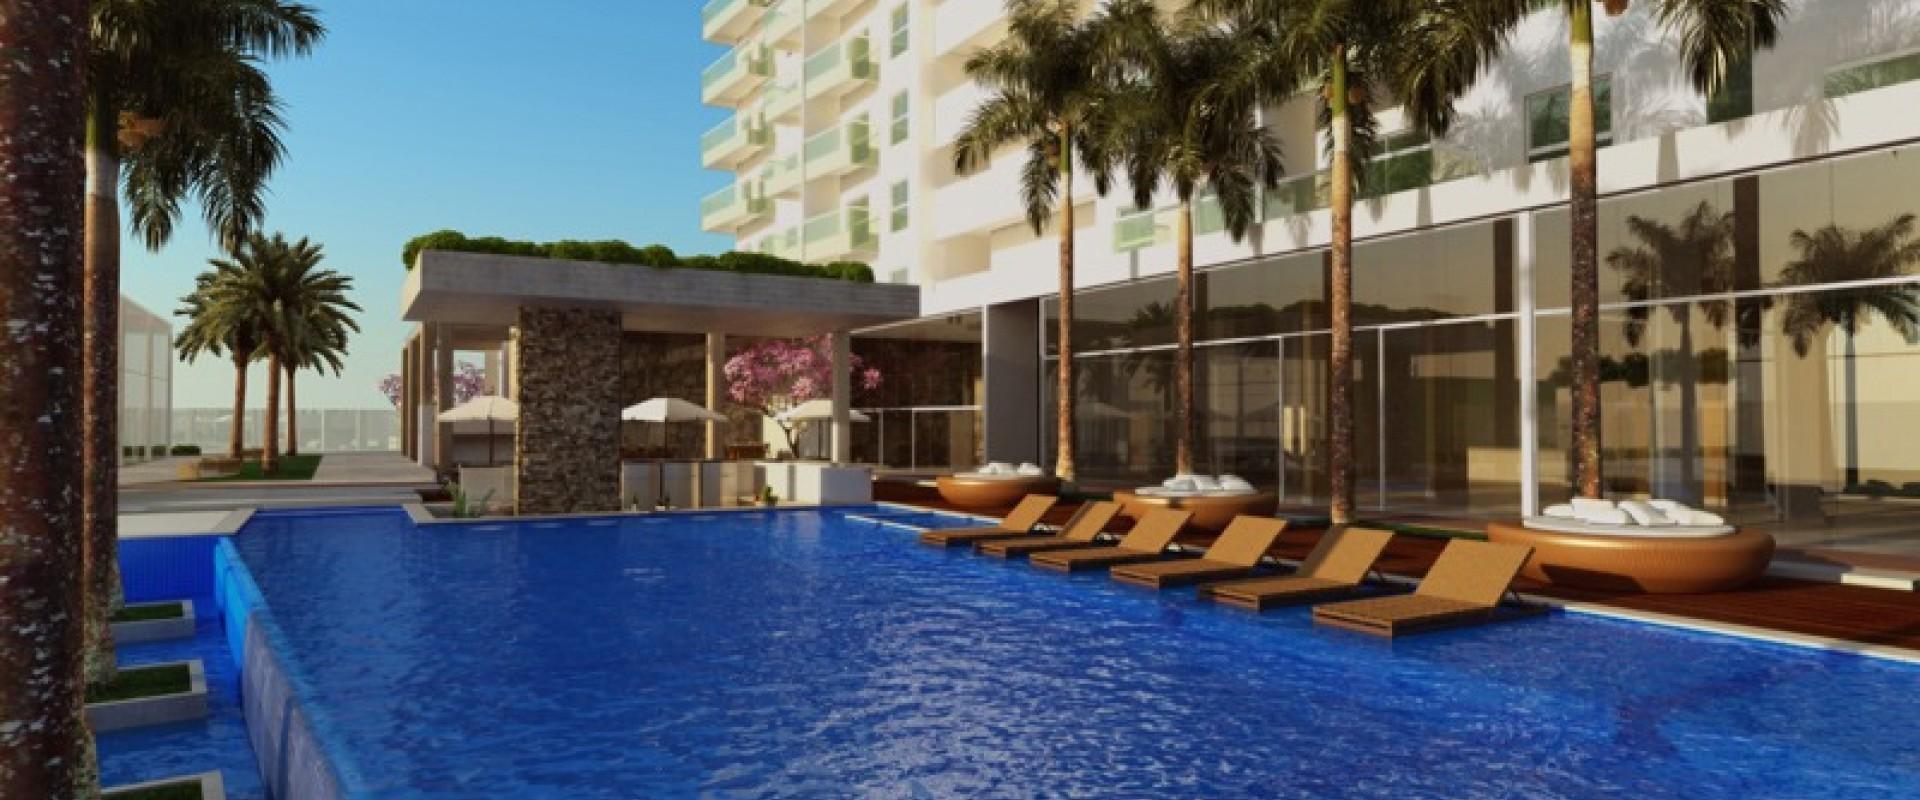 Riviera Concept Apartamento no Riviera Concept na Praia Brava em Itajaí